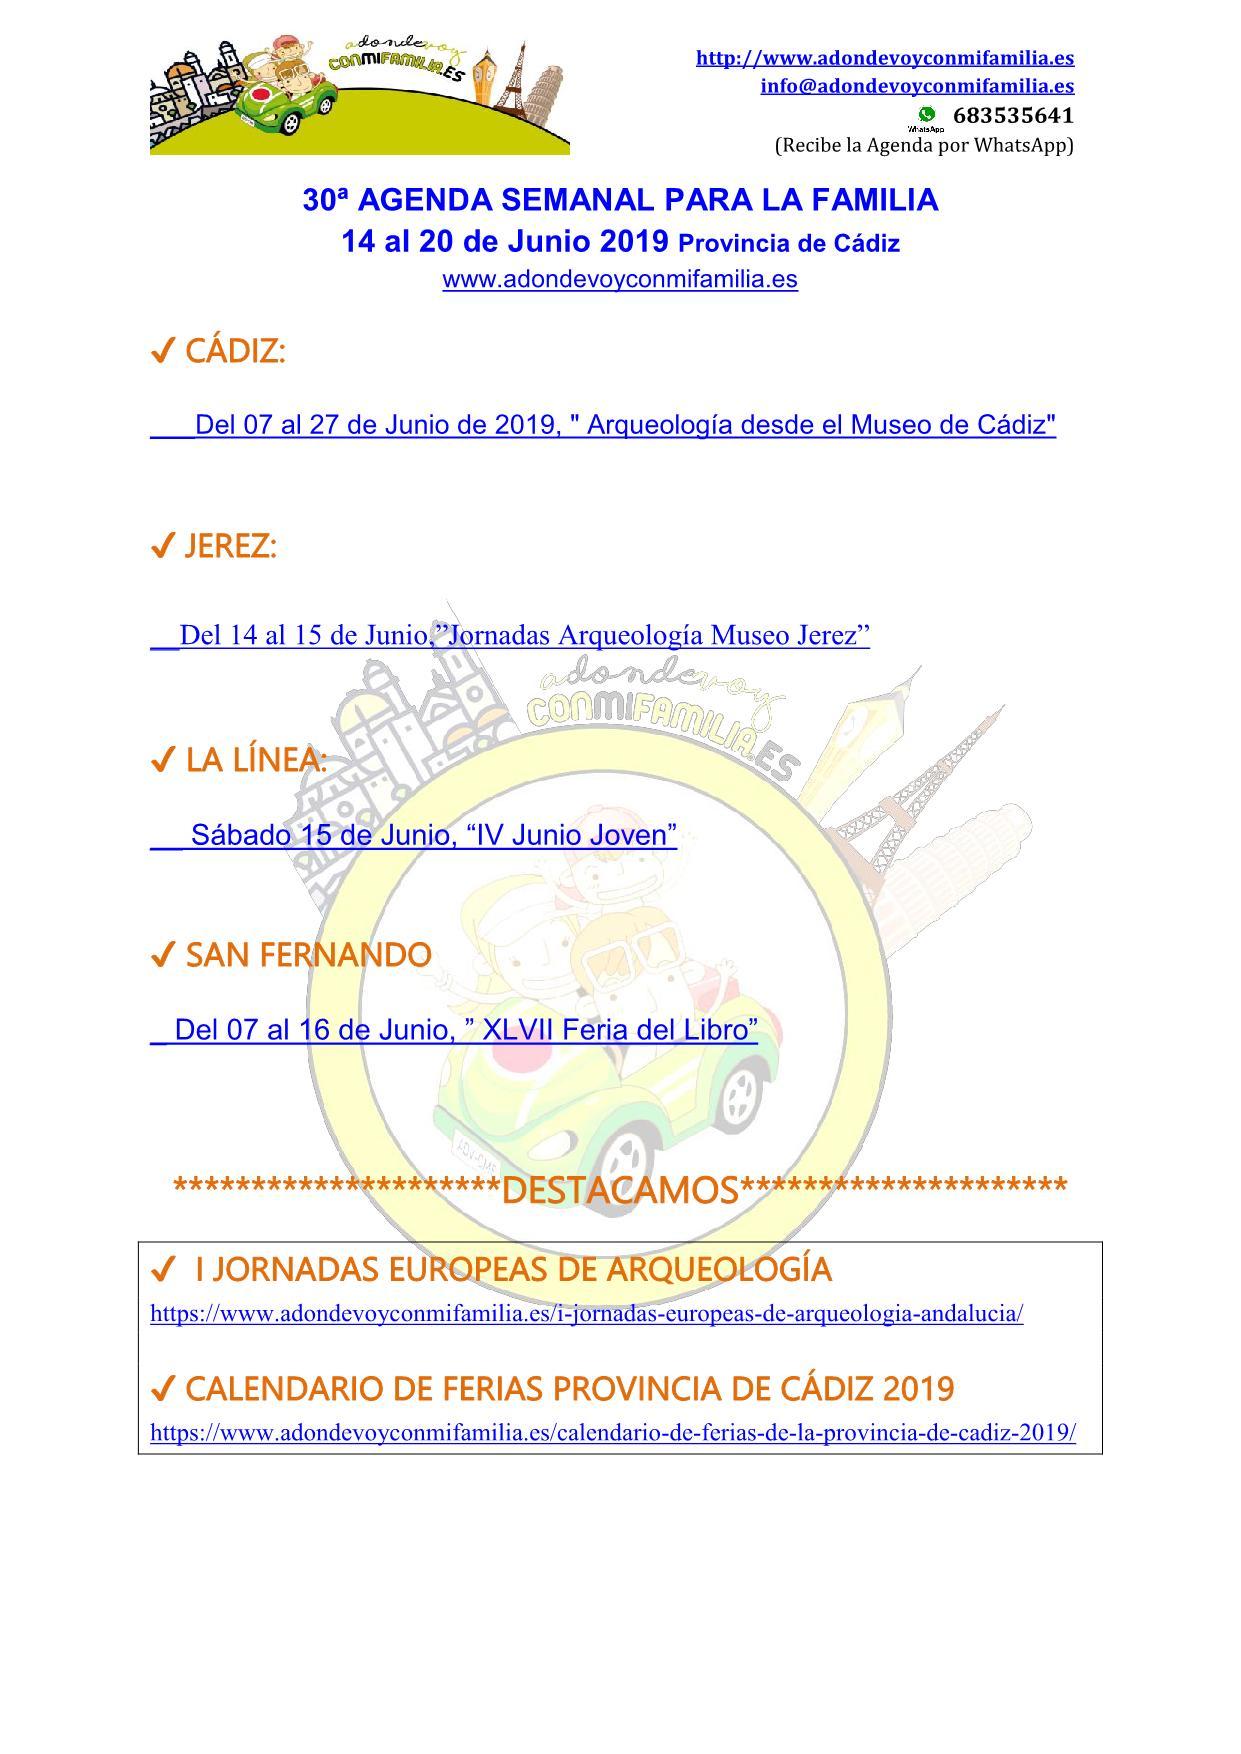 030 Agenda semanal familiar 14 al 20 Junio 2019